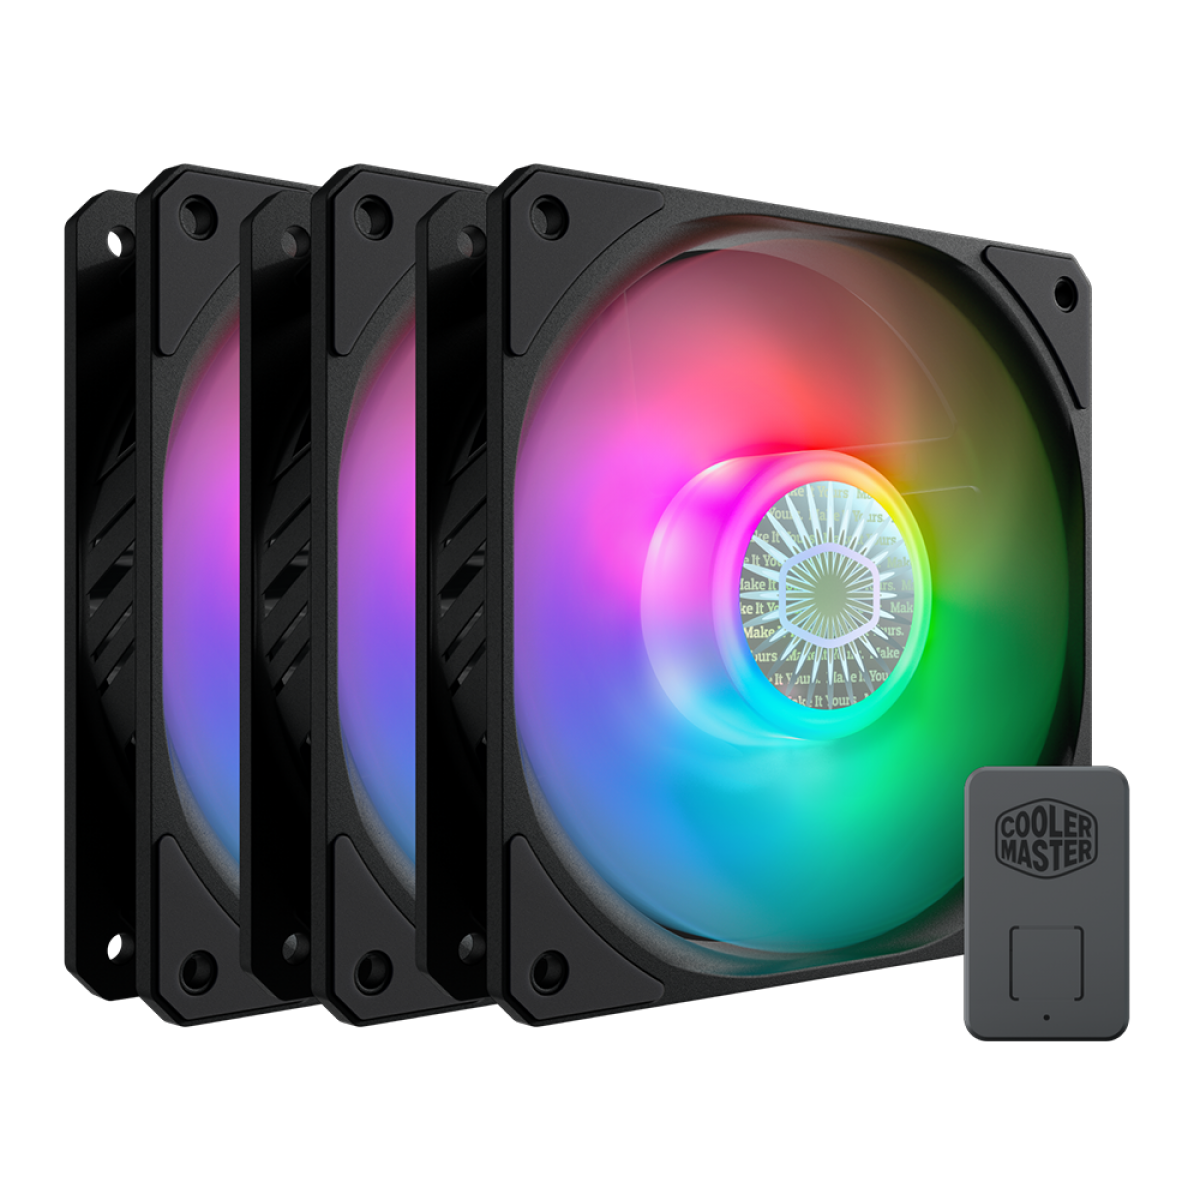 Kit Fan com 3 Unidades, Cooler Master, SickleFlow MasterFan MF120 Halo, RGB, 120mm, 1800RPM, MFX-B2DN-183PA-R1